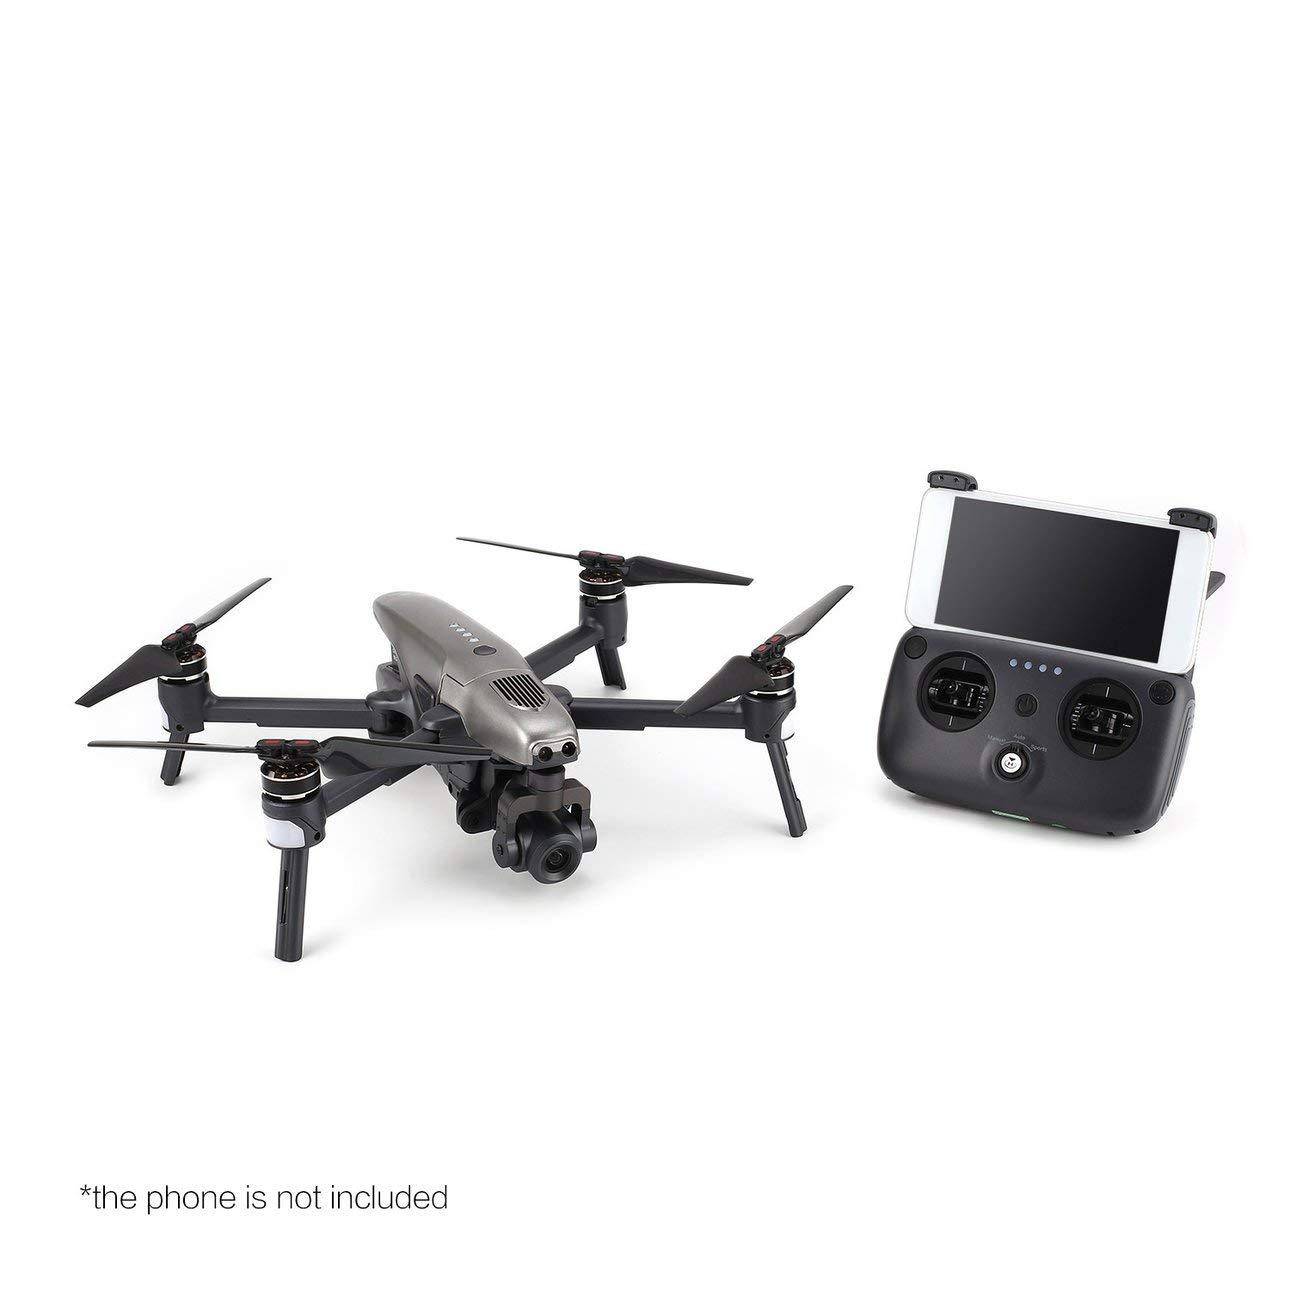 Drohne mit Kamera Walkera Vitus 320 RC Drohne 5.8G WiFi FPV 4K Kamera Selfie Quadcopter AR Drohne von Ballylyly